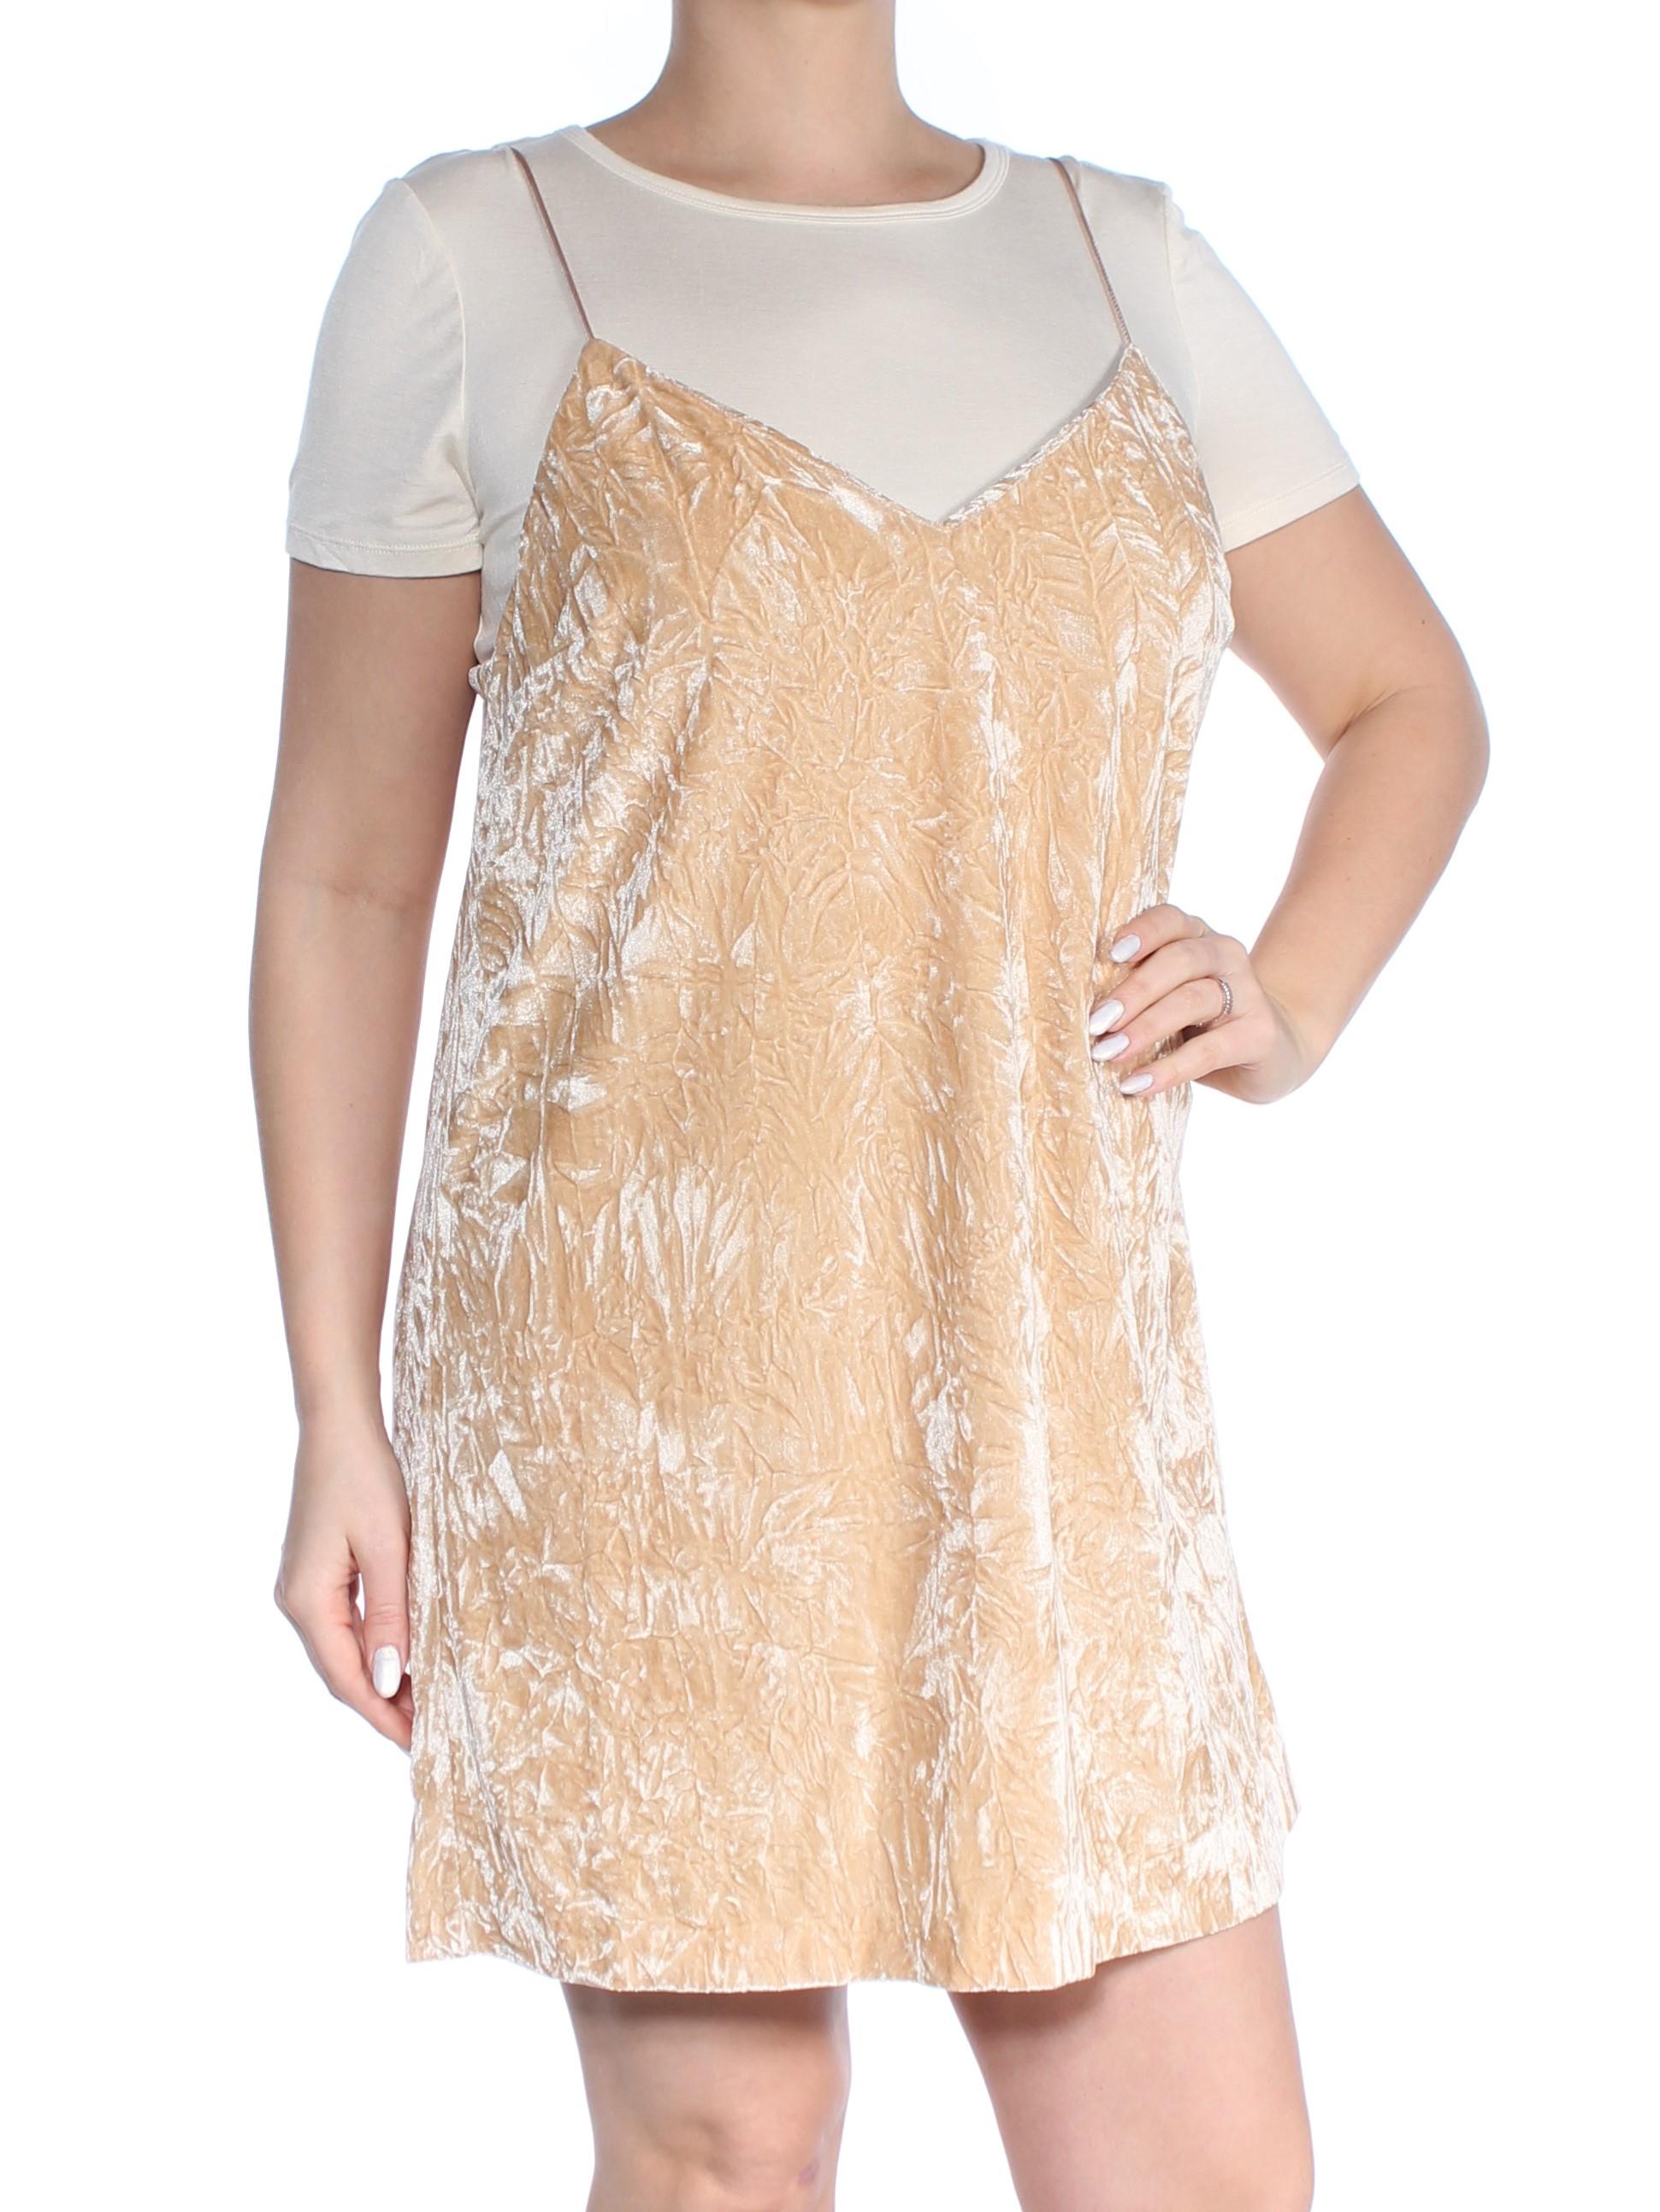 Jeweled High Neck Short Black Dress